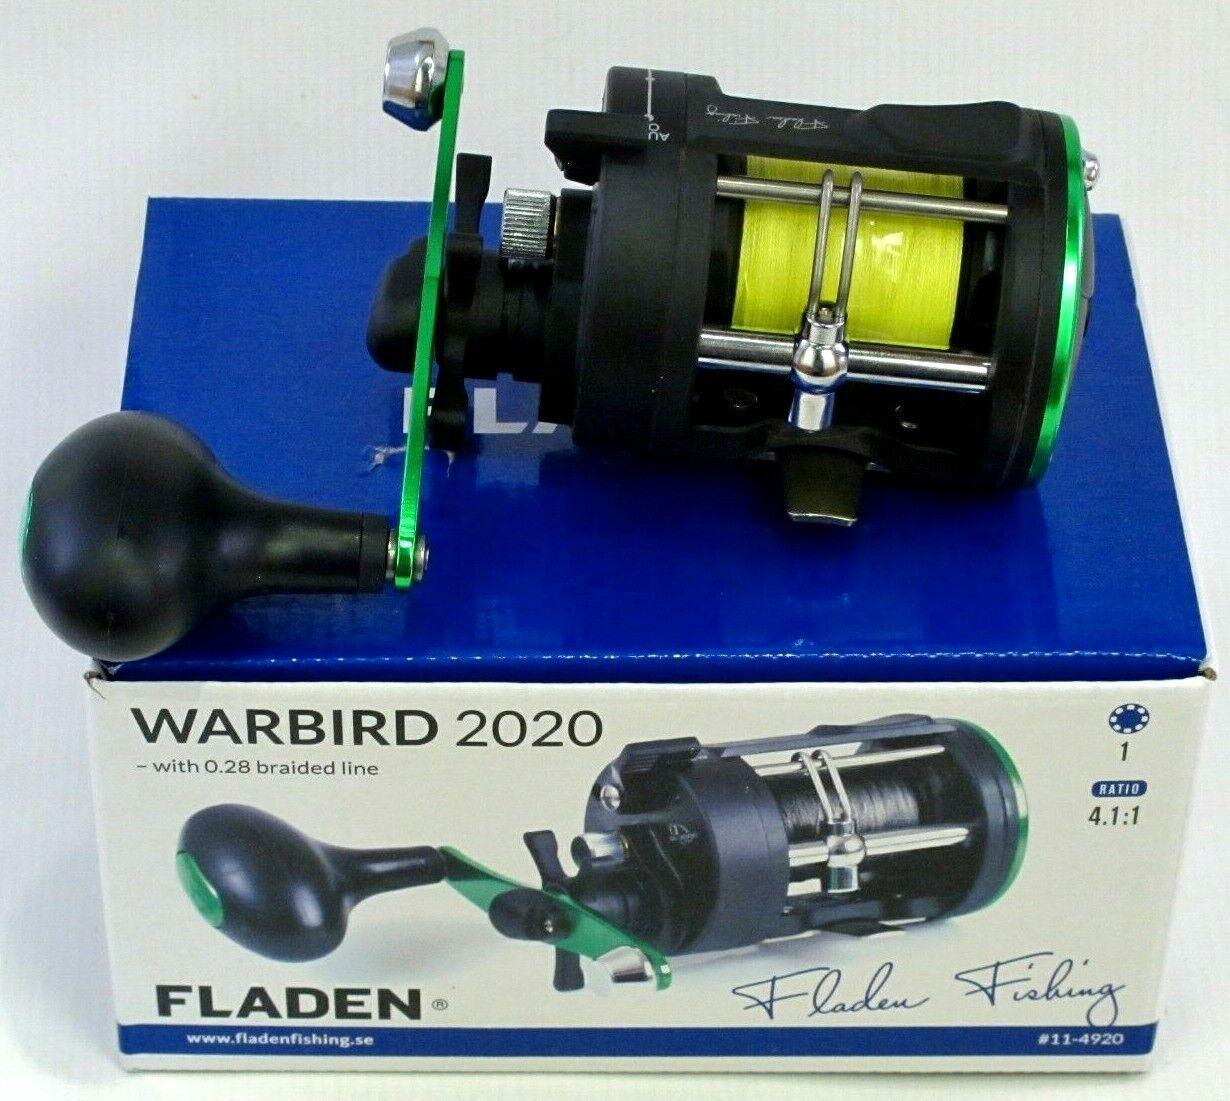 Fladen Warbird 2020 barco 1bb Mar  Multiplicador Reel De Pesca Con 0.28 Trenza de línea  Web oficial